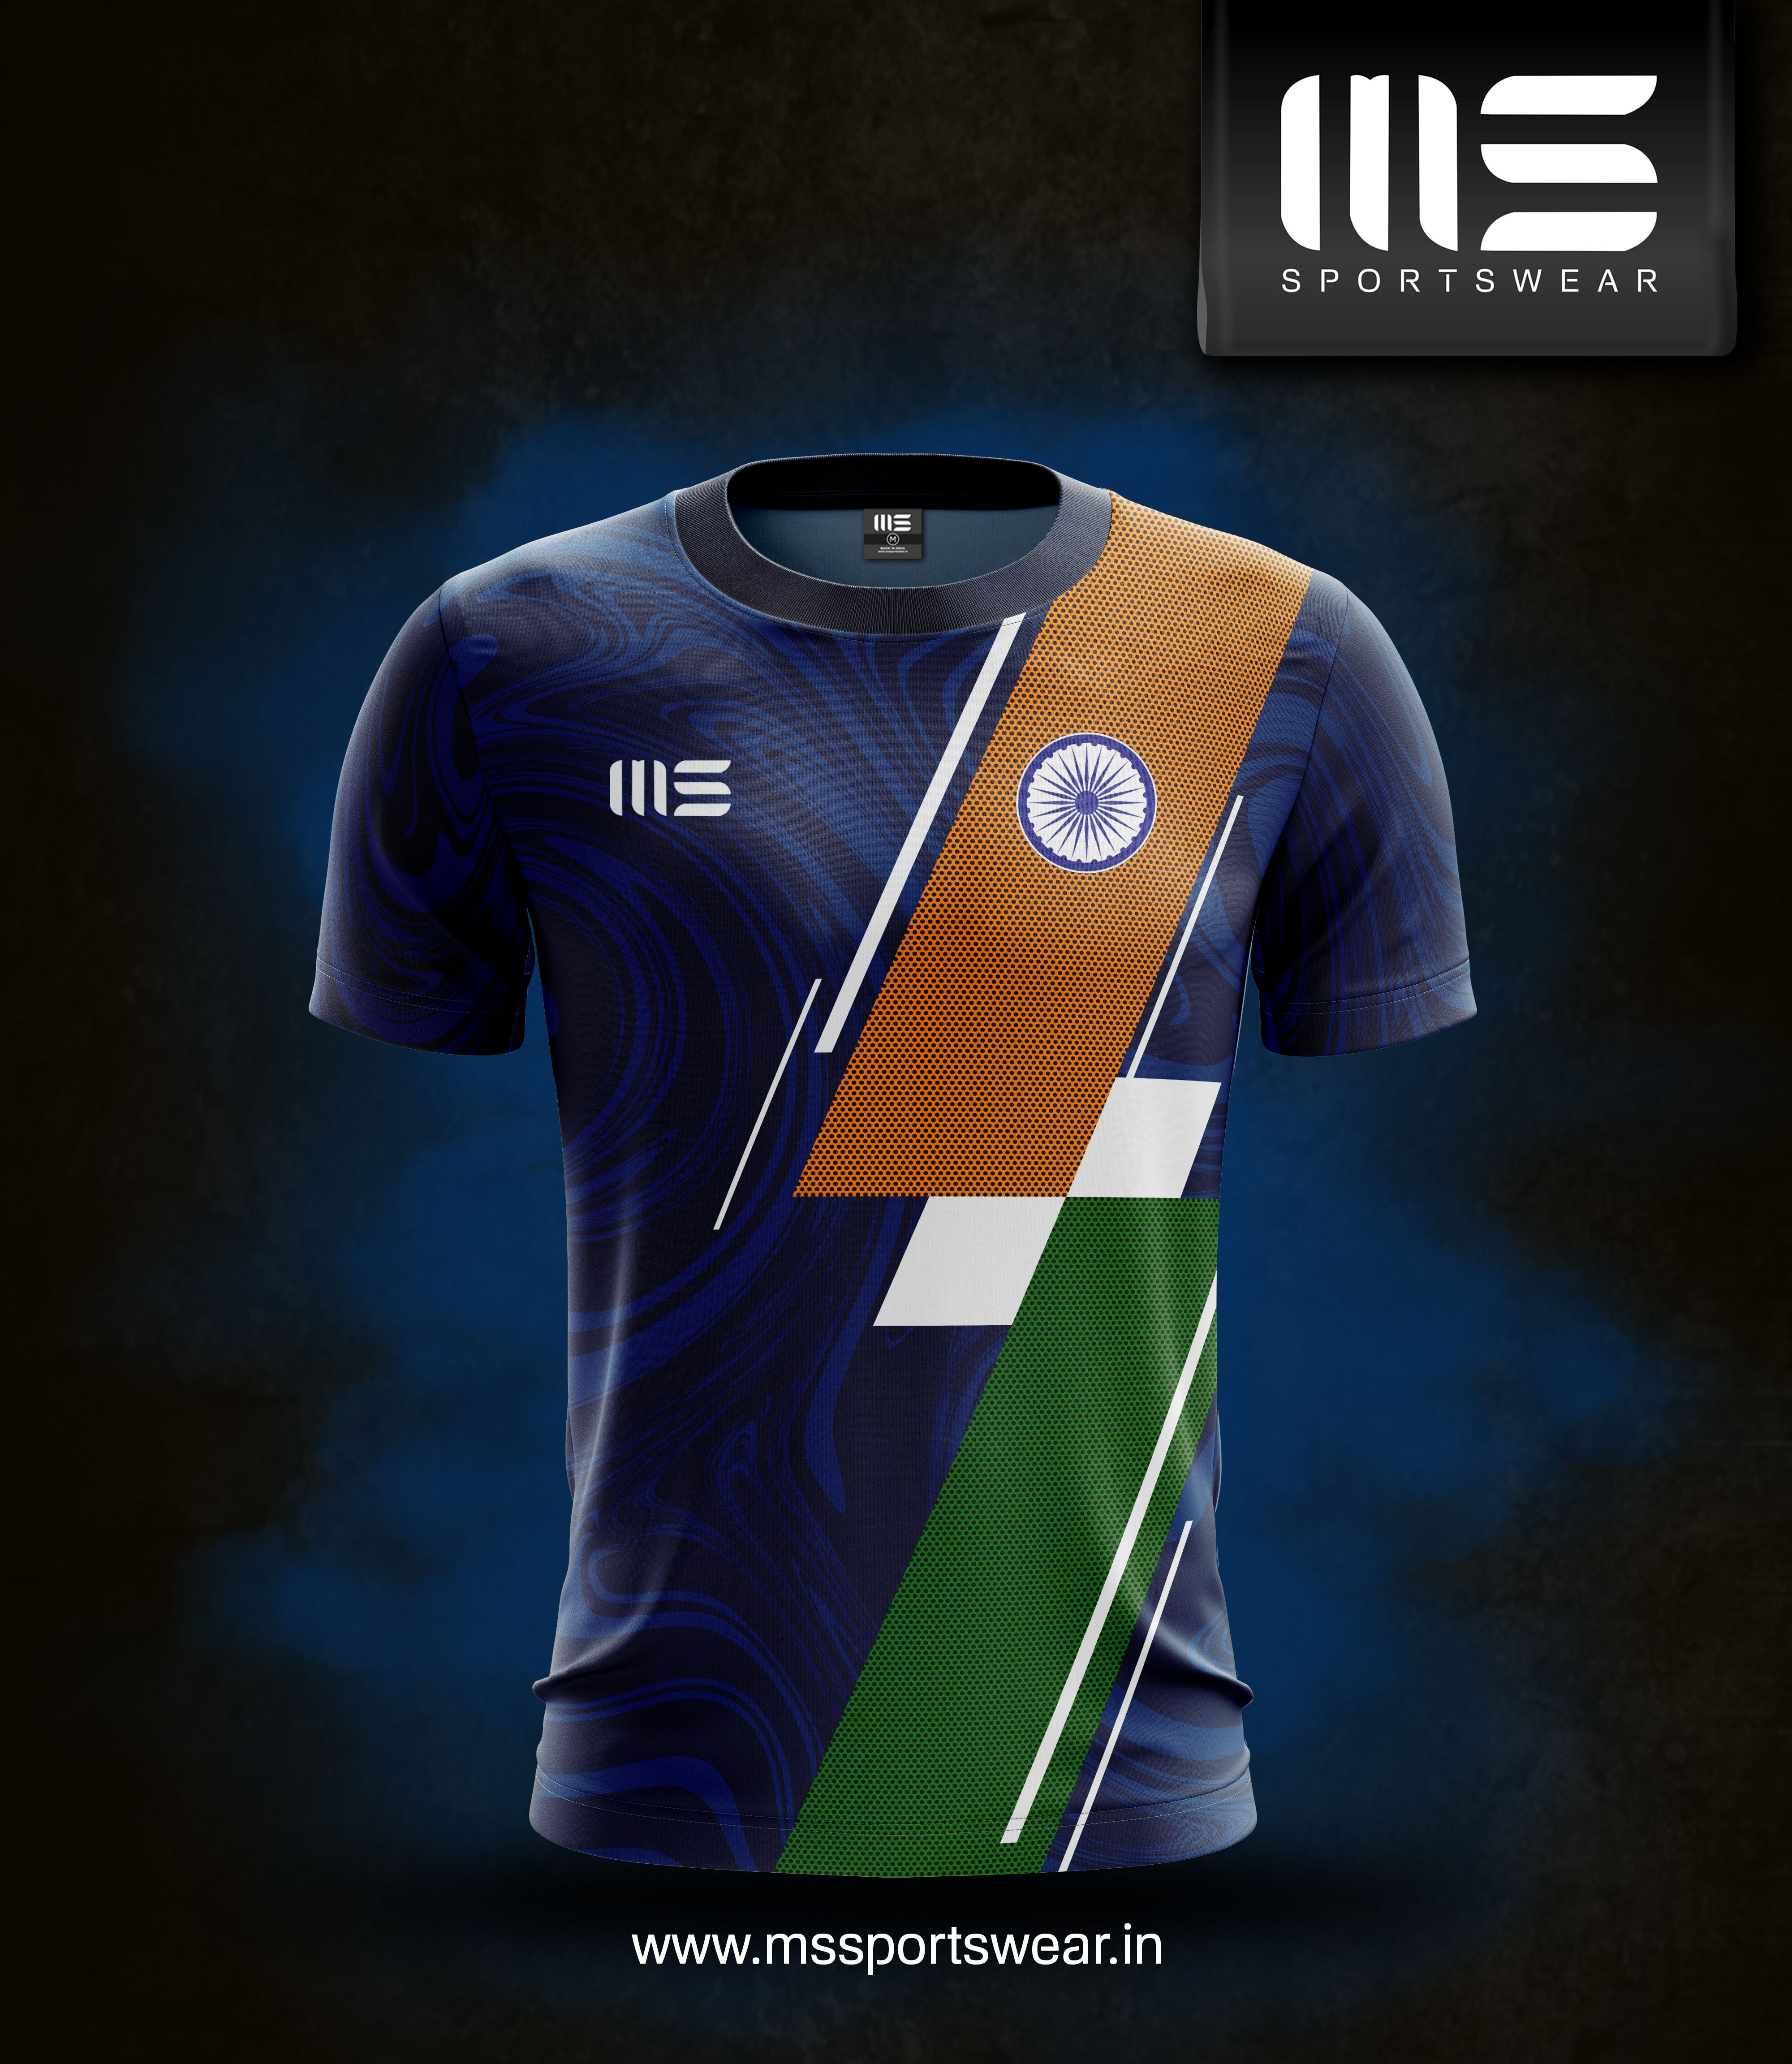 Ms Sportswear In 2020 Sports Tshirt Designs Sports Jersey Design Jersey Design